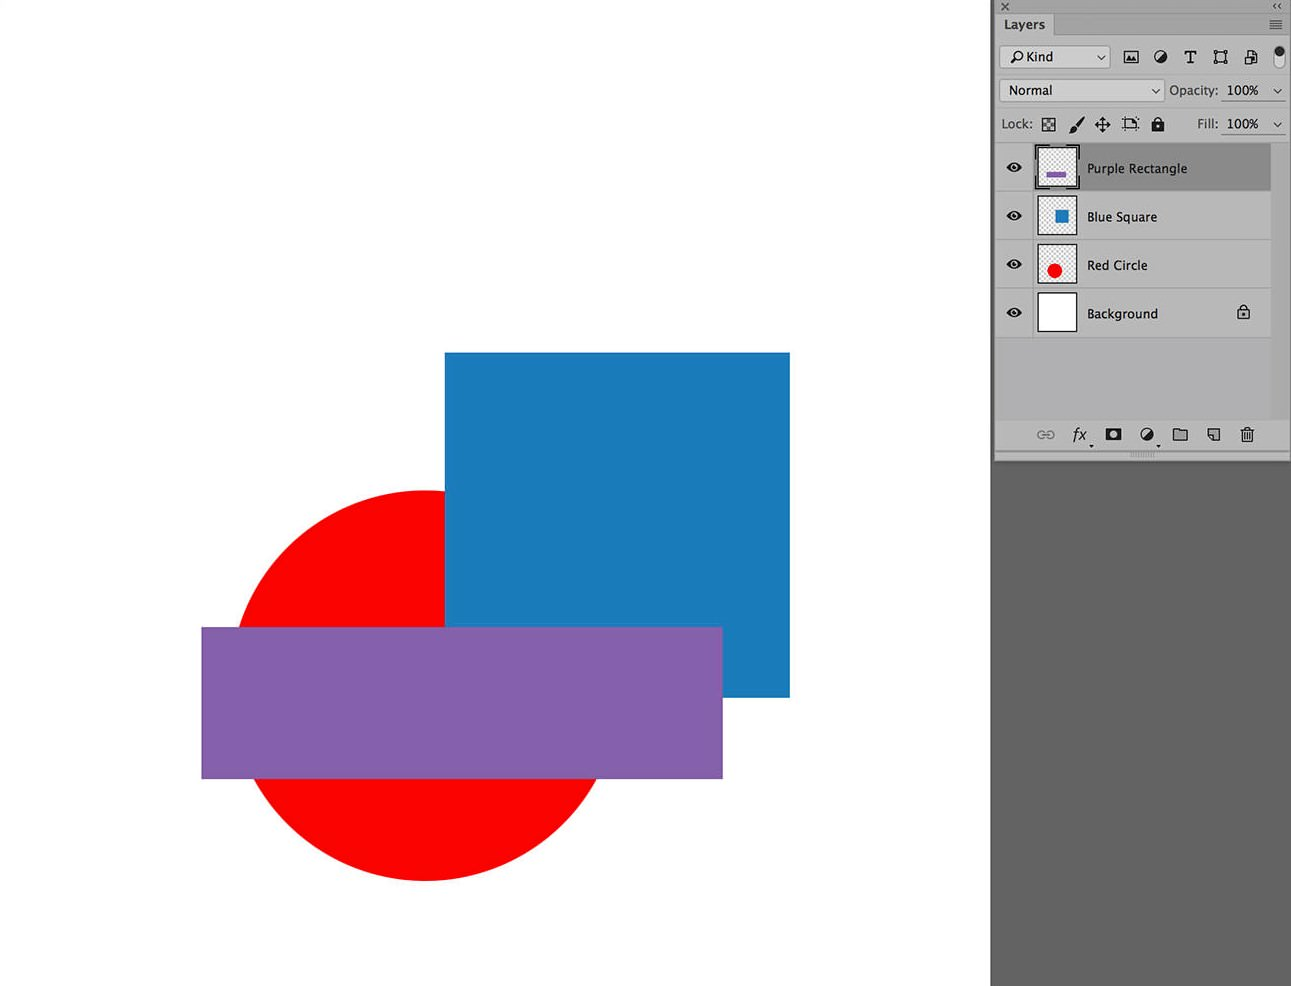 photoshop layers rearrange